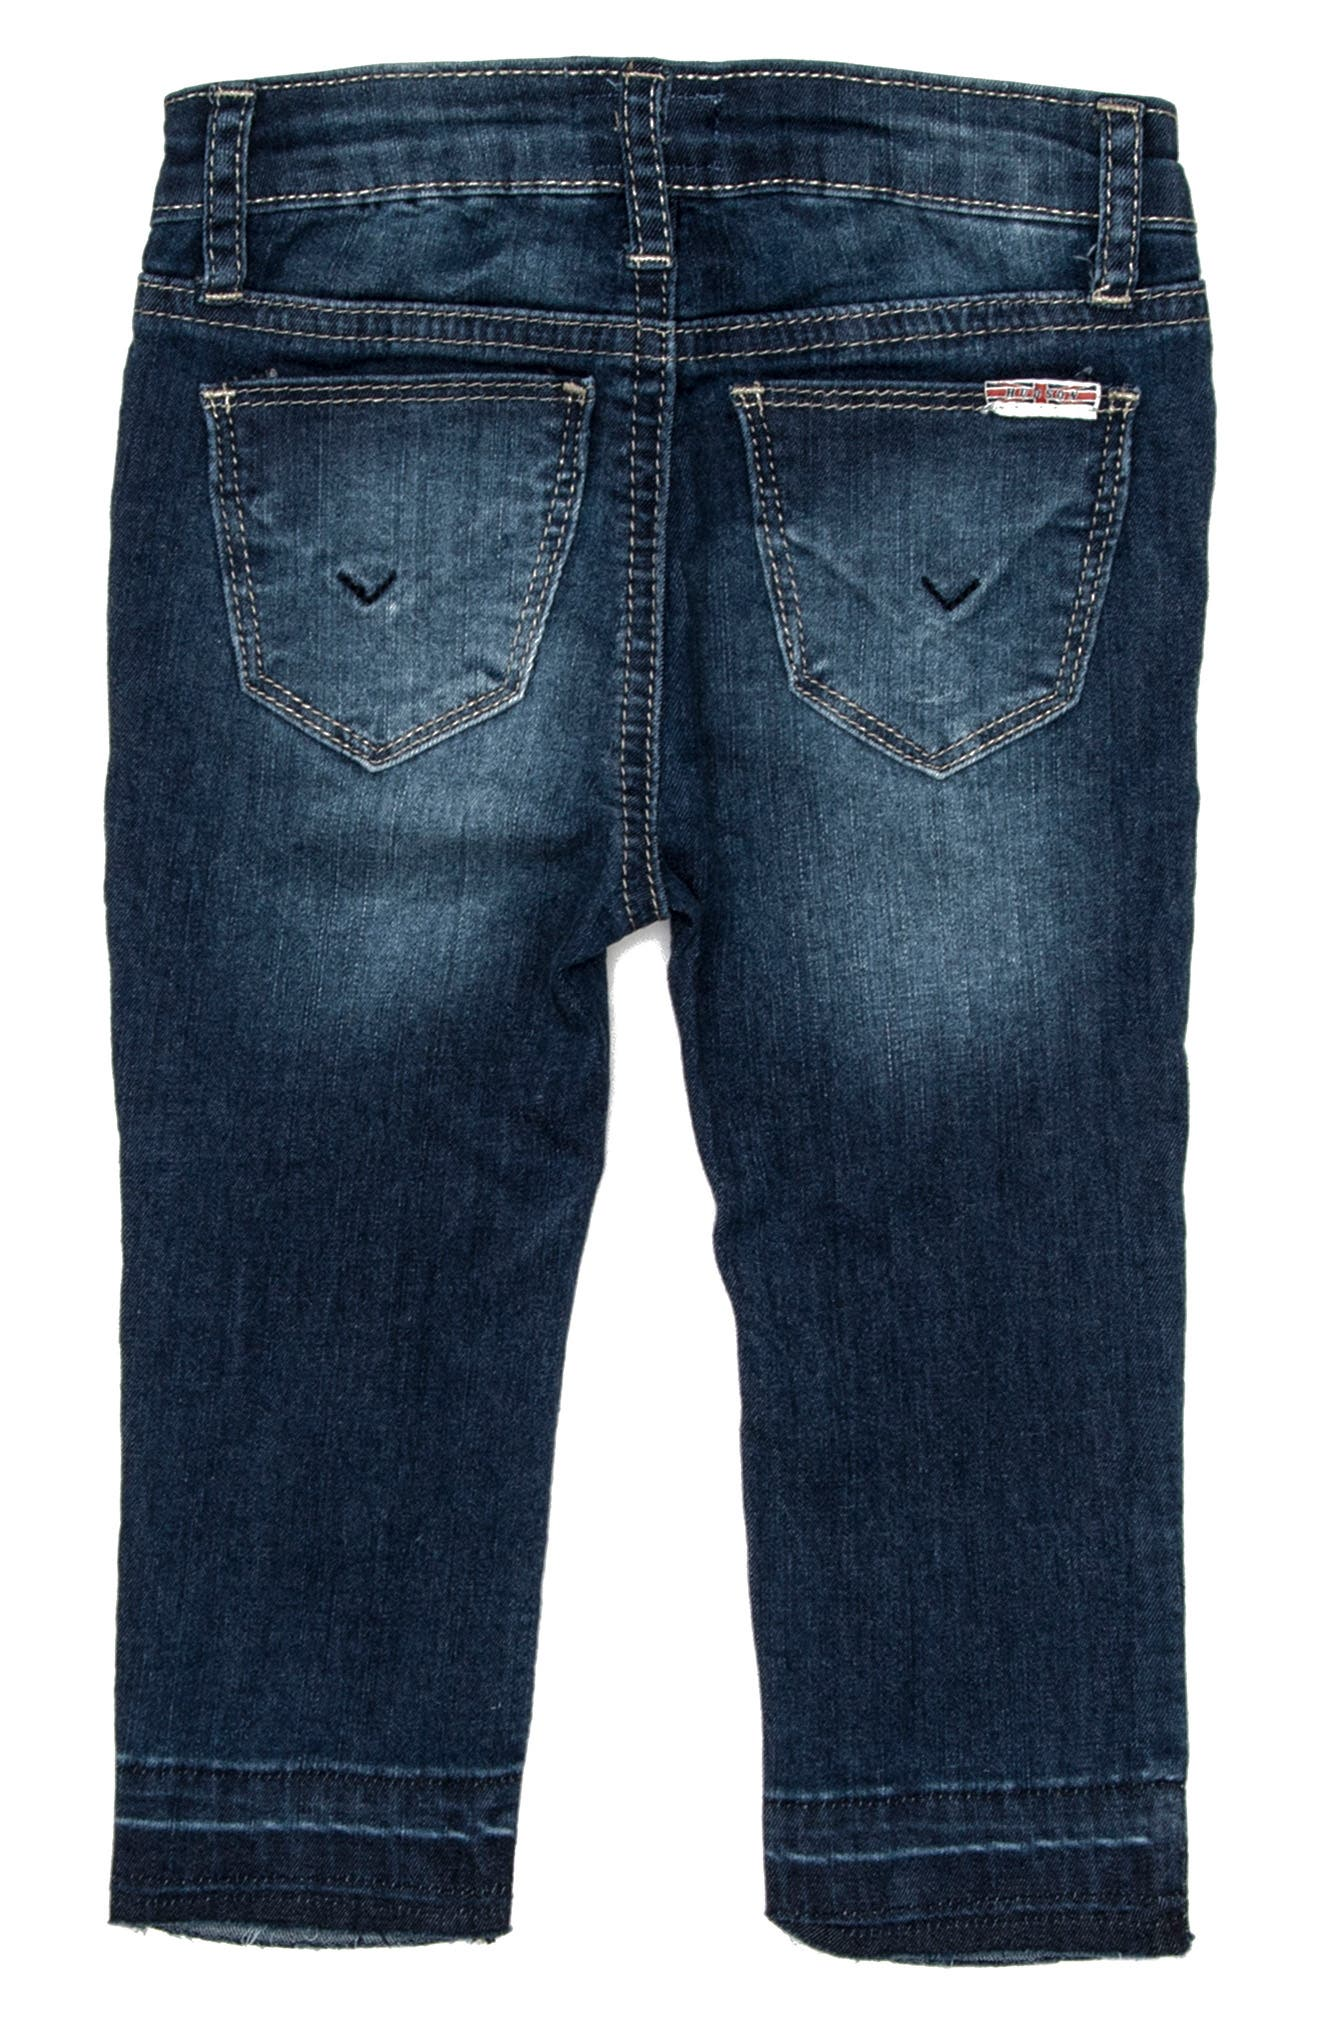 Christa Super Stretch Skinny Jeans,                         Main,                         color, 491